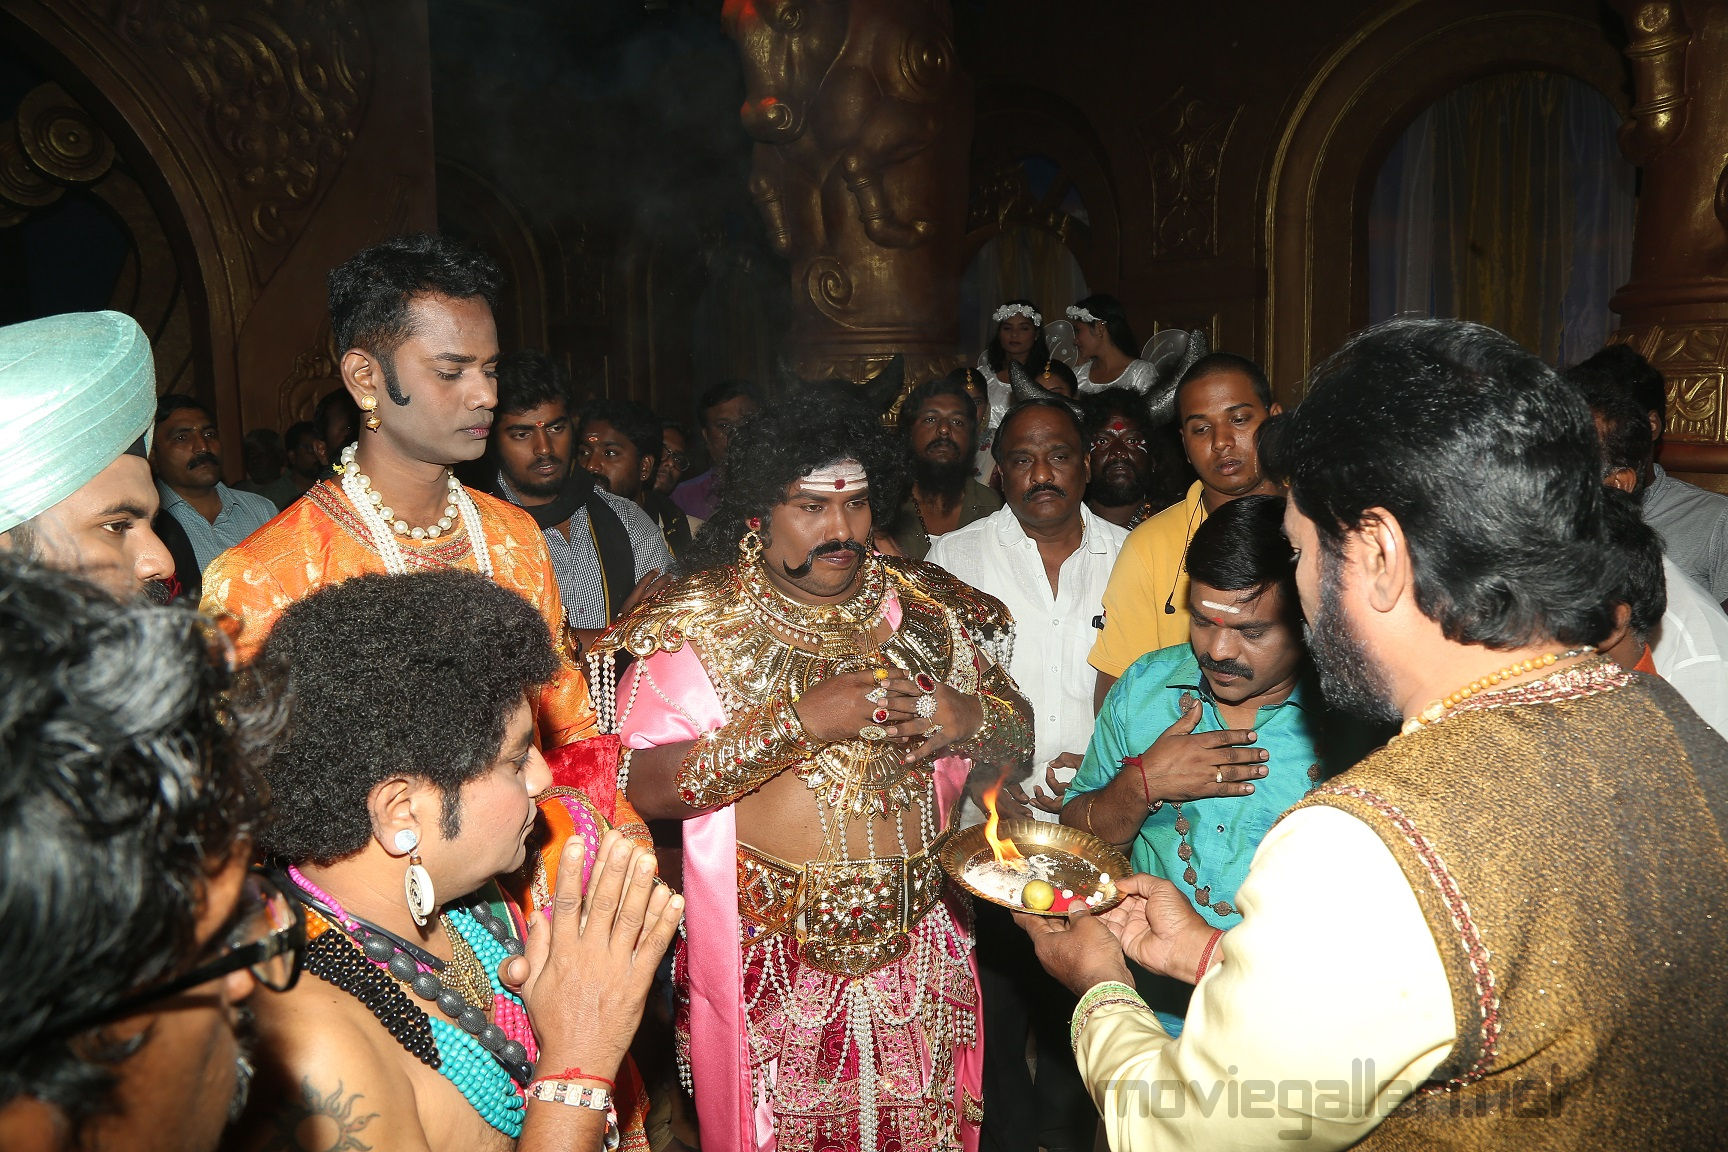 Yogi Babu's Dharma Prabhu goes on Floors